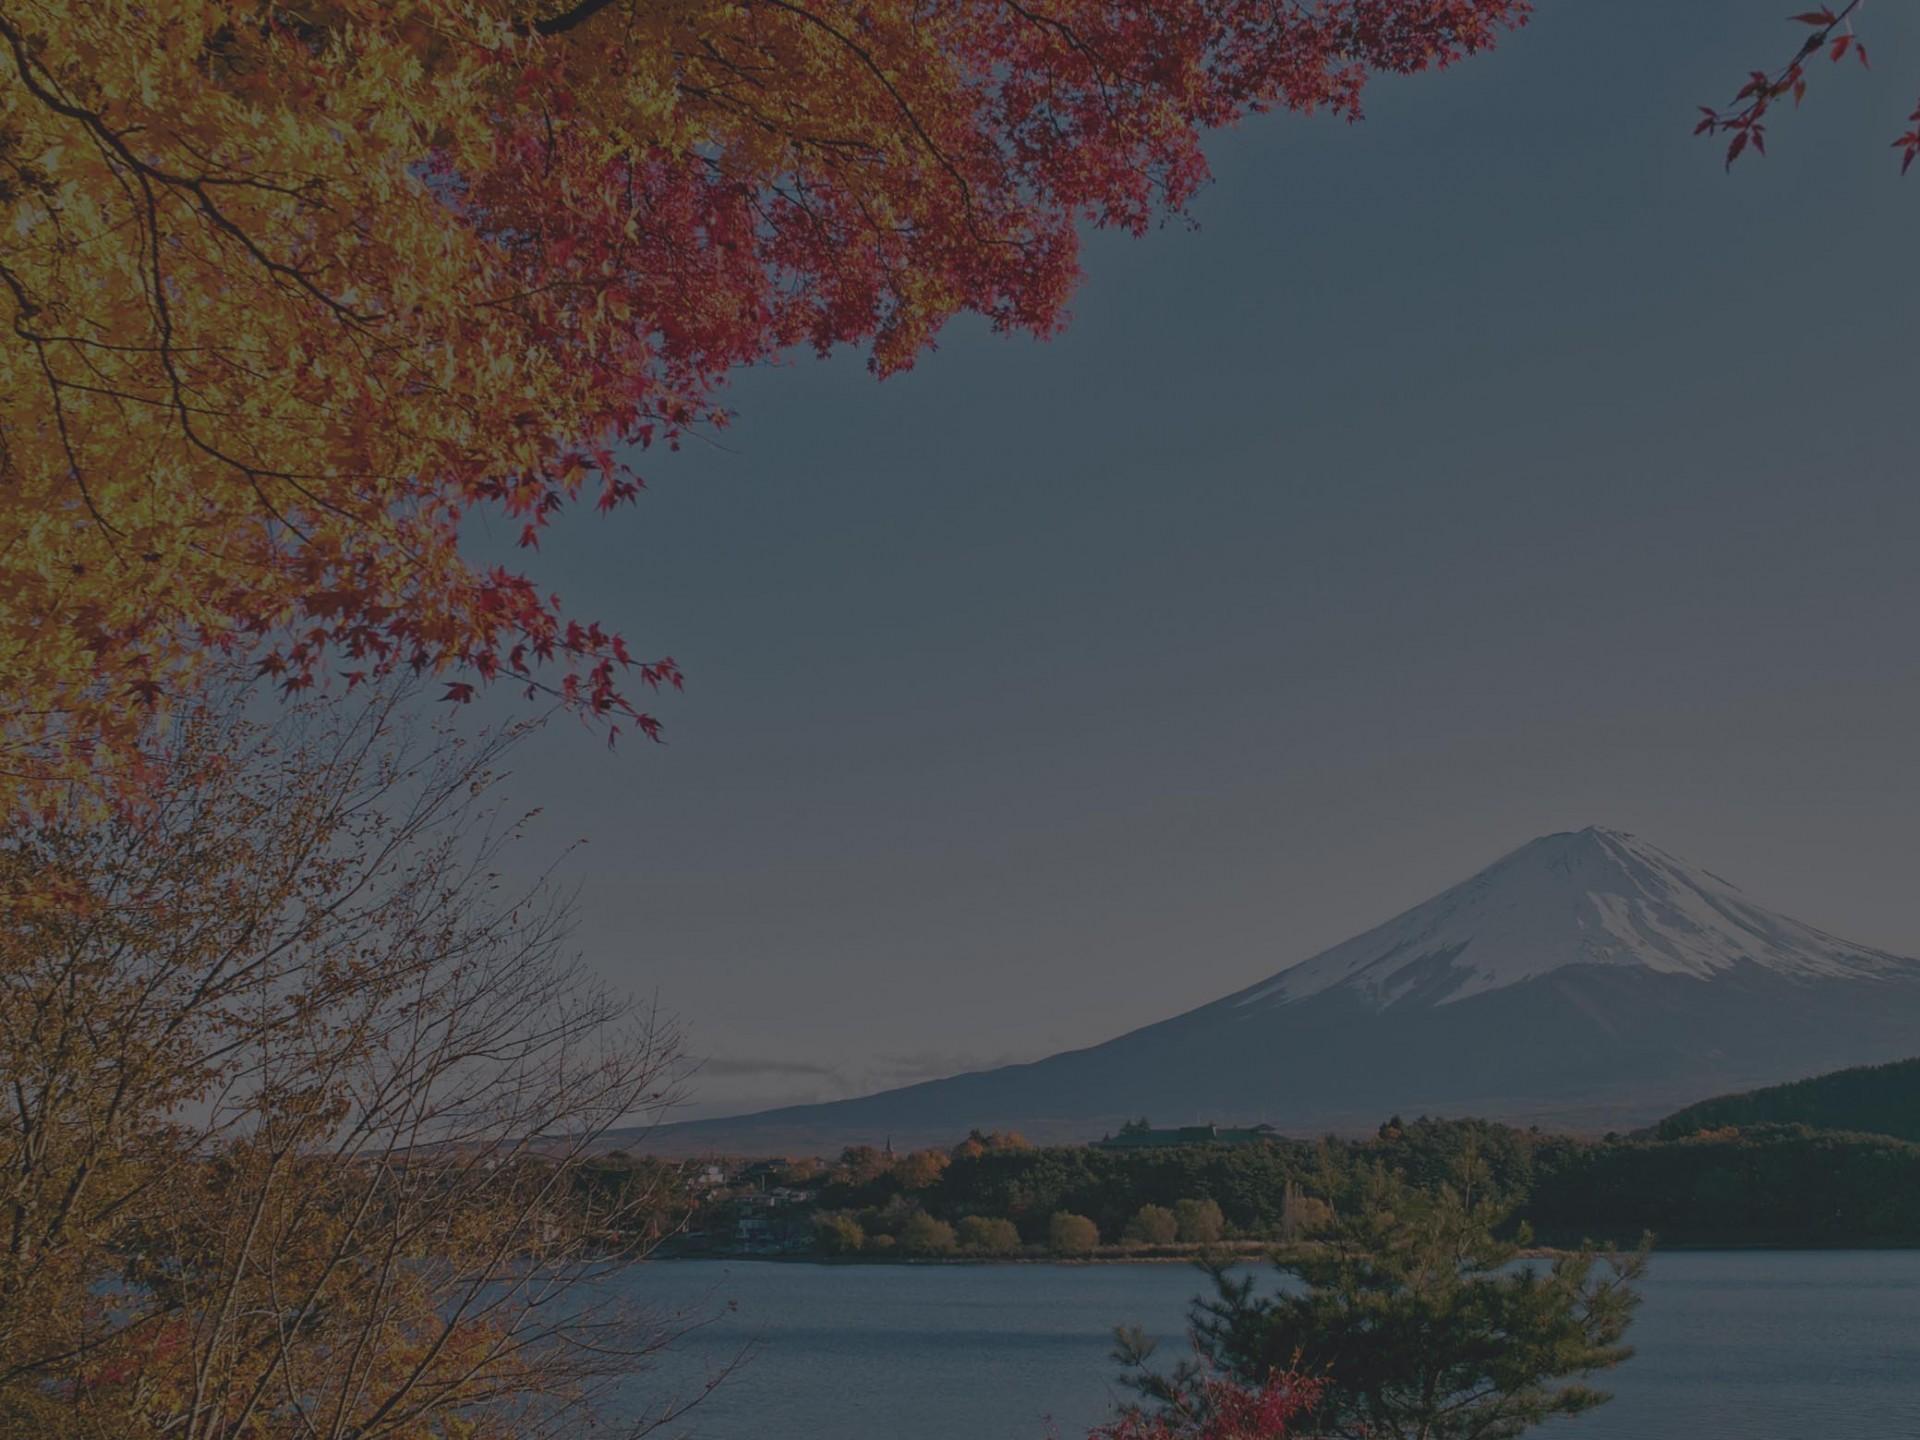 empresa-especializada-diseno-paginas-web-granada-agencia-viajes-kaunai-cabecera